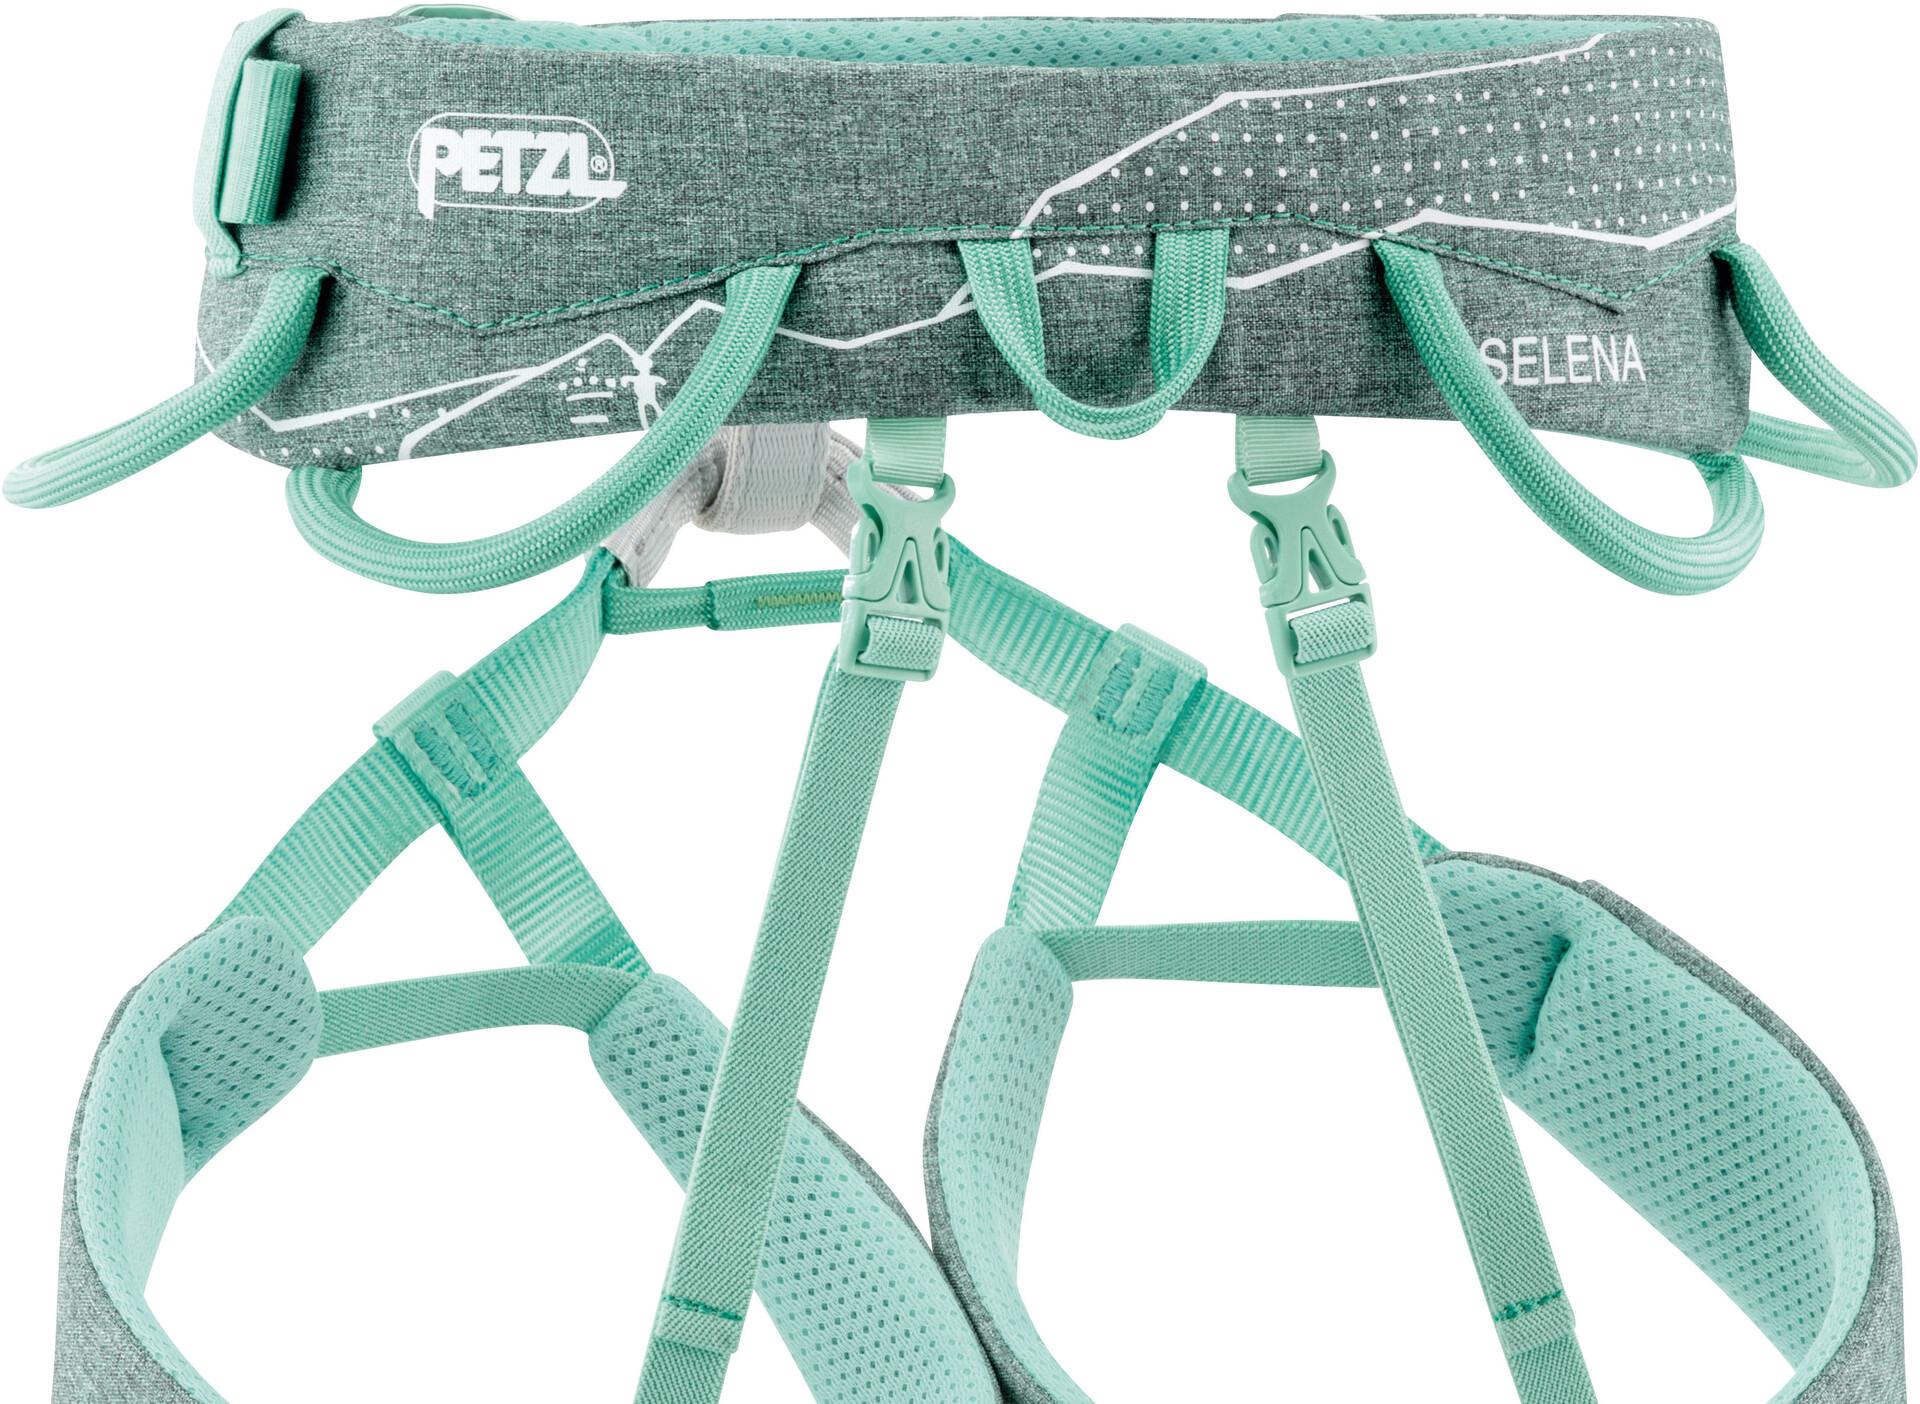 Petzl Klettergurt Luna Test : Petzl selena klettergurt damen grün meliert campz